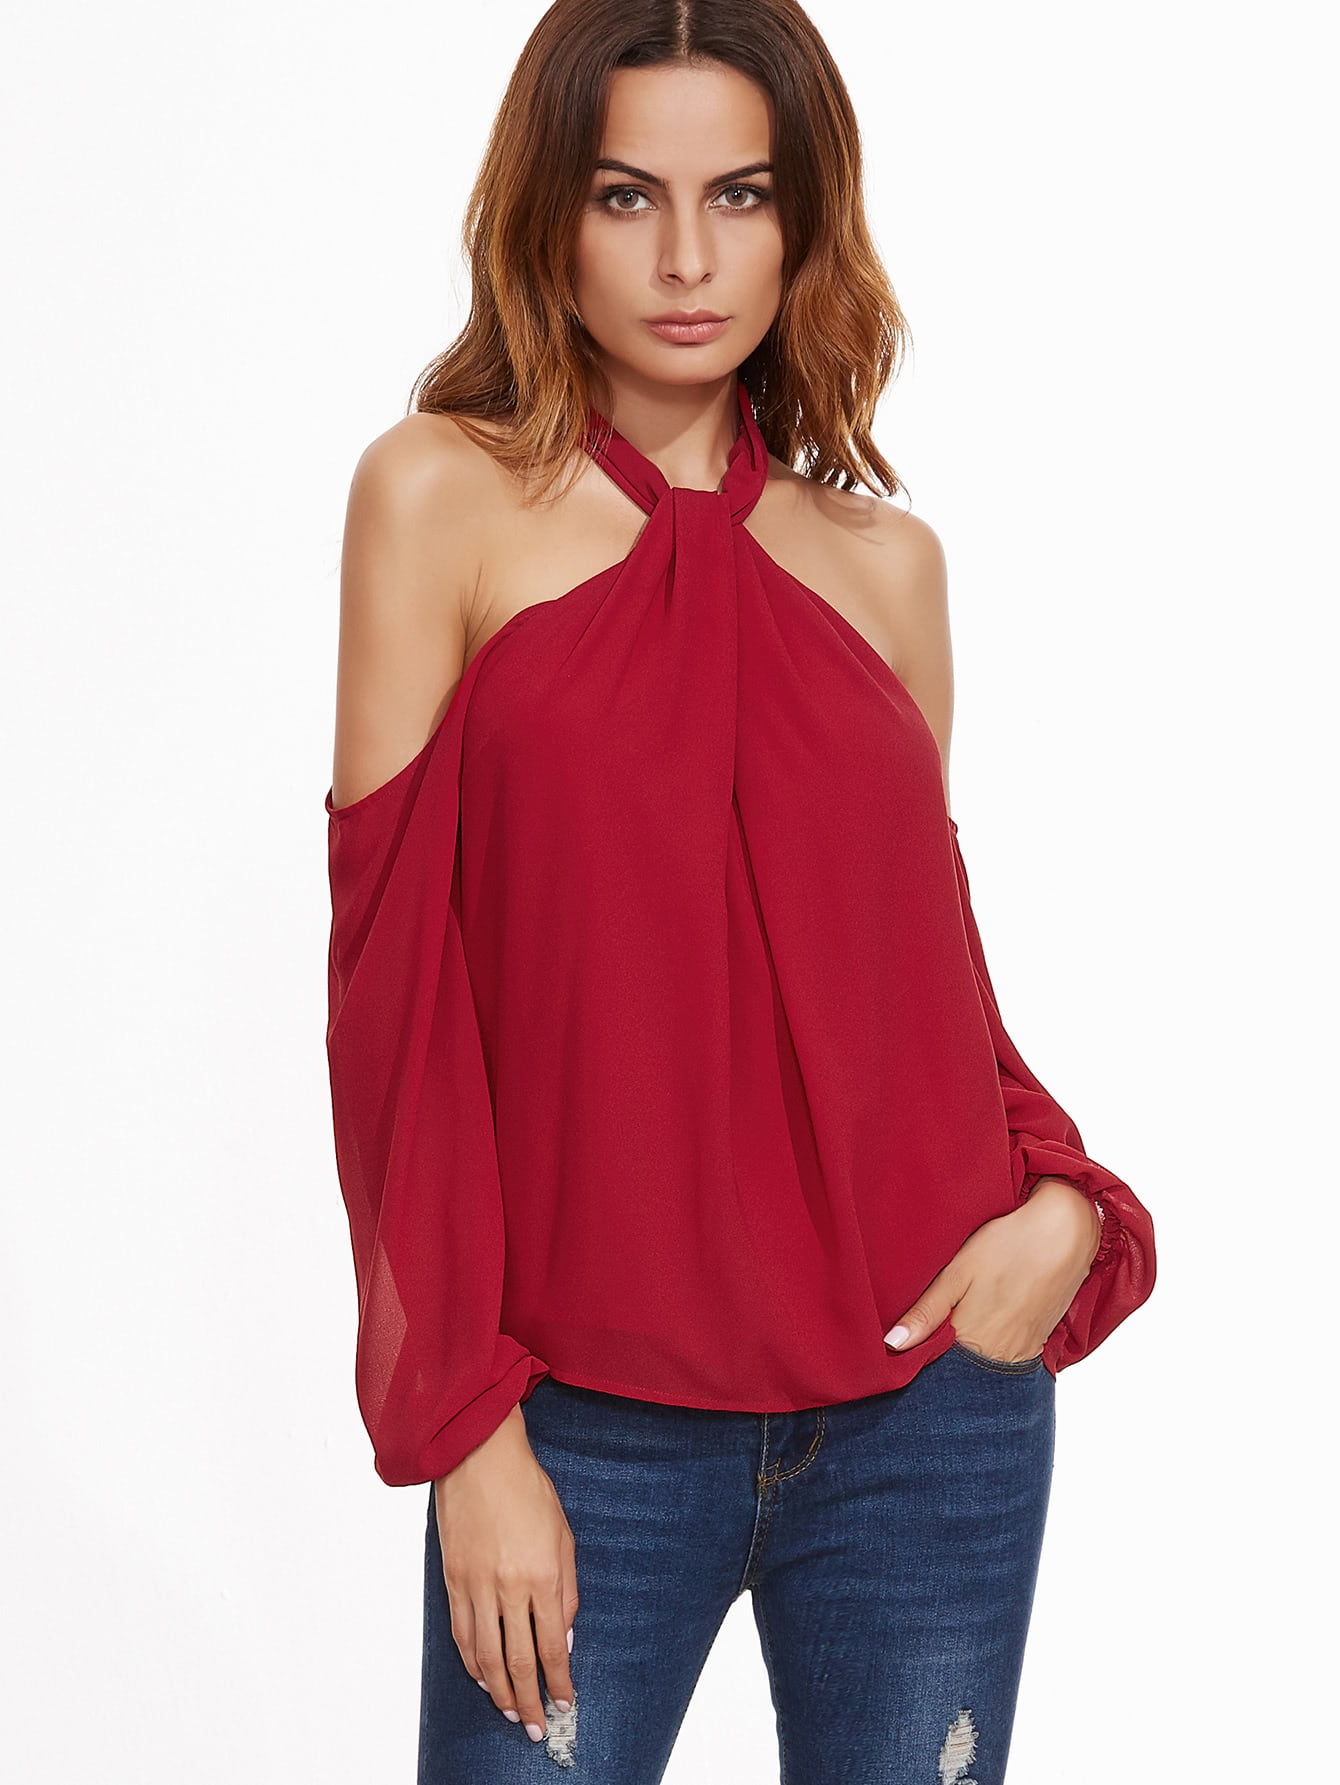 blouse161027704_2